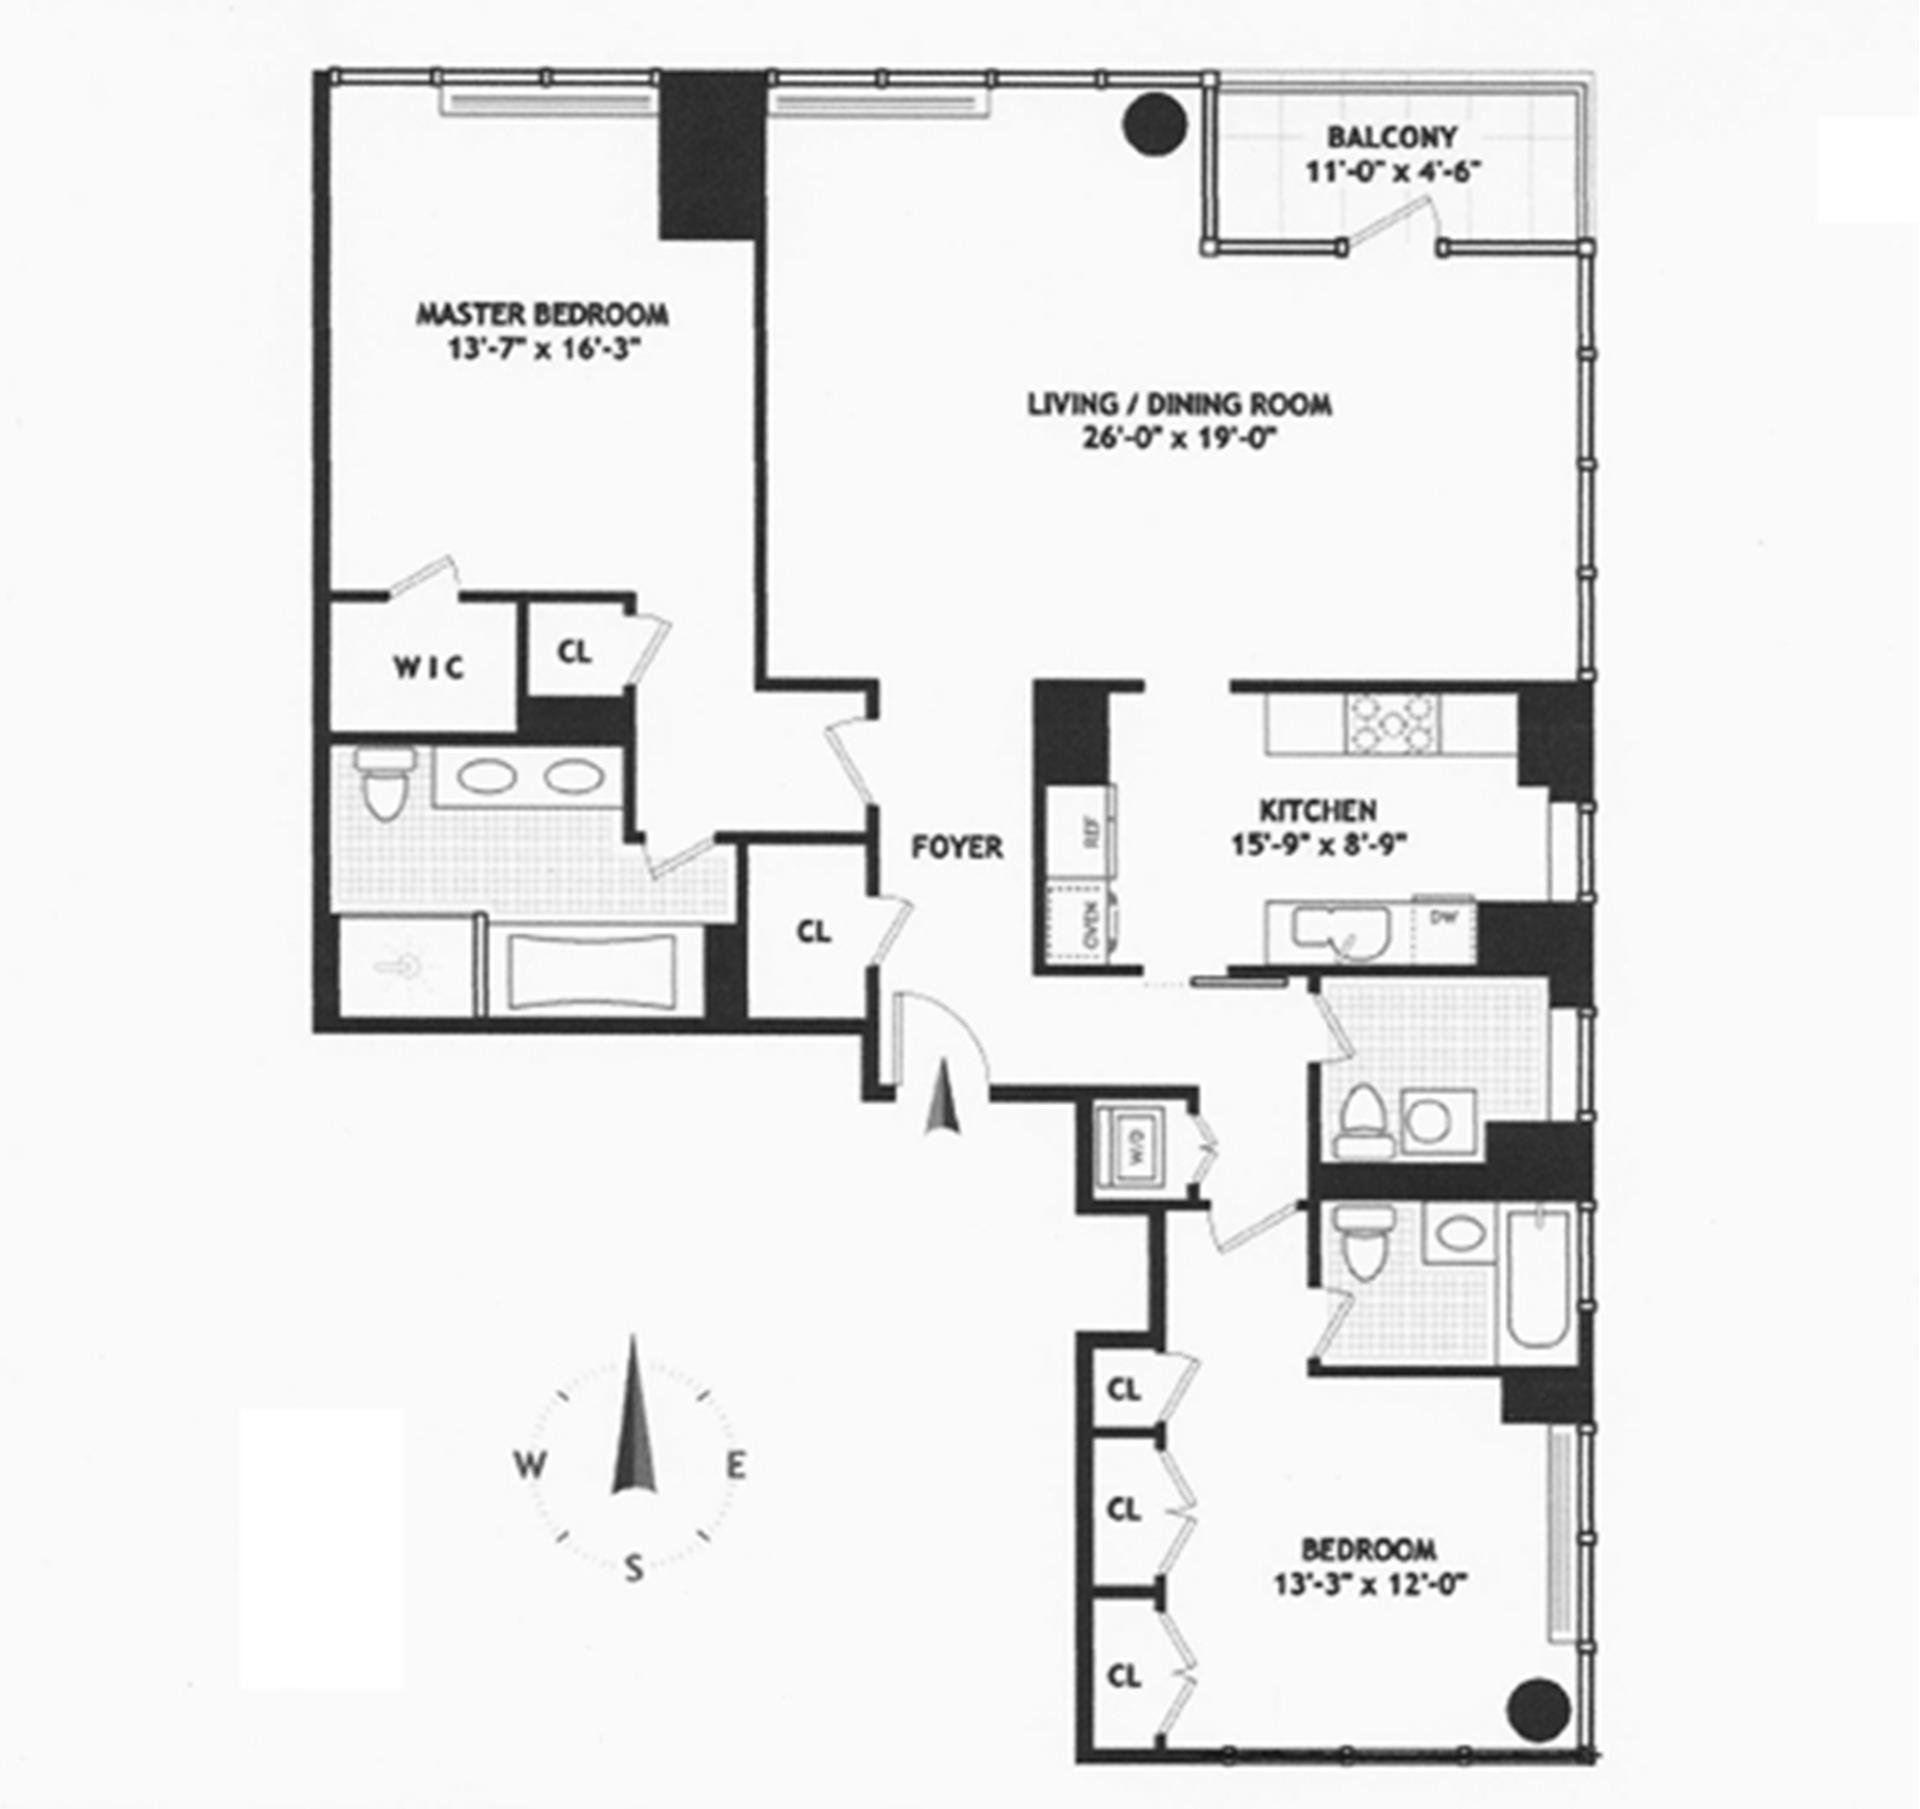 Floor plan of The Three Ten, 310 East 53rd St, 23ABC - Sutton Area, New York